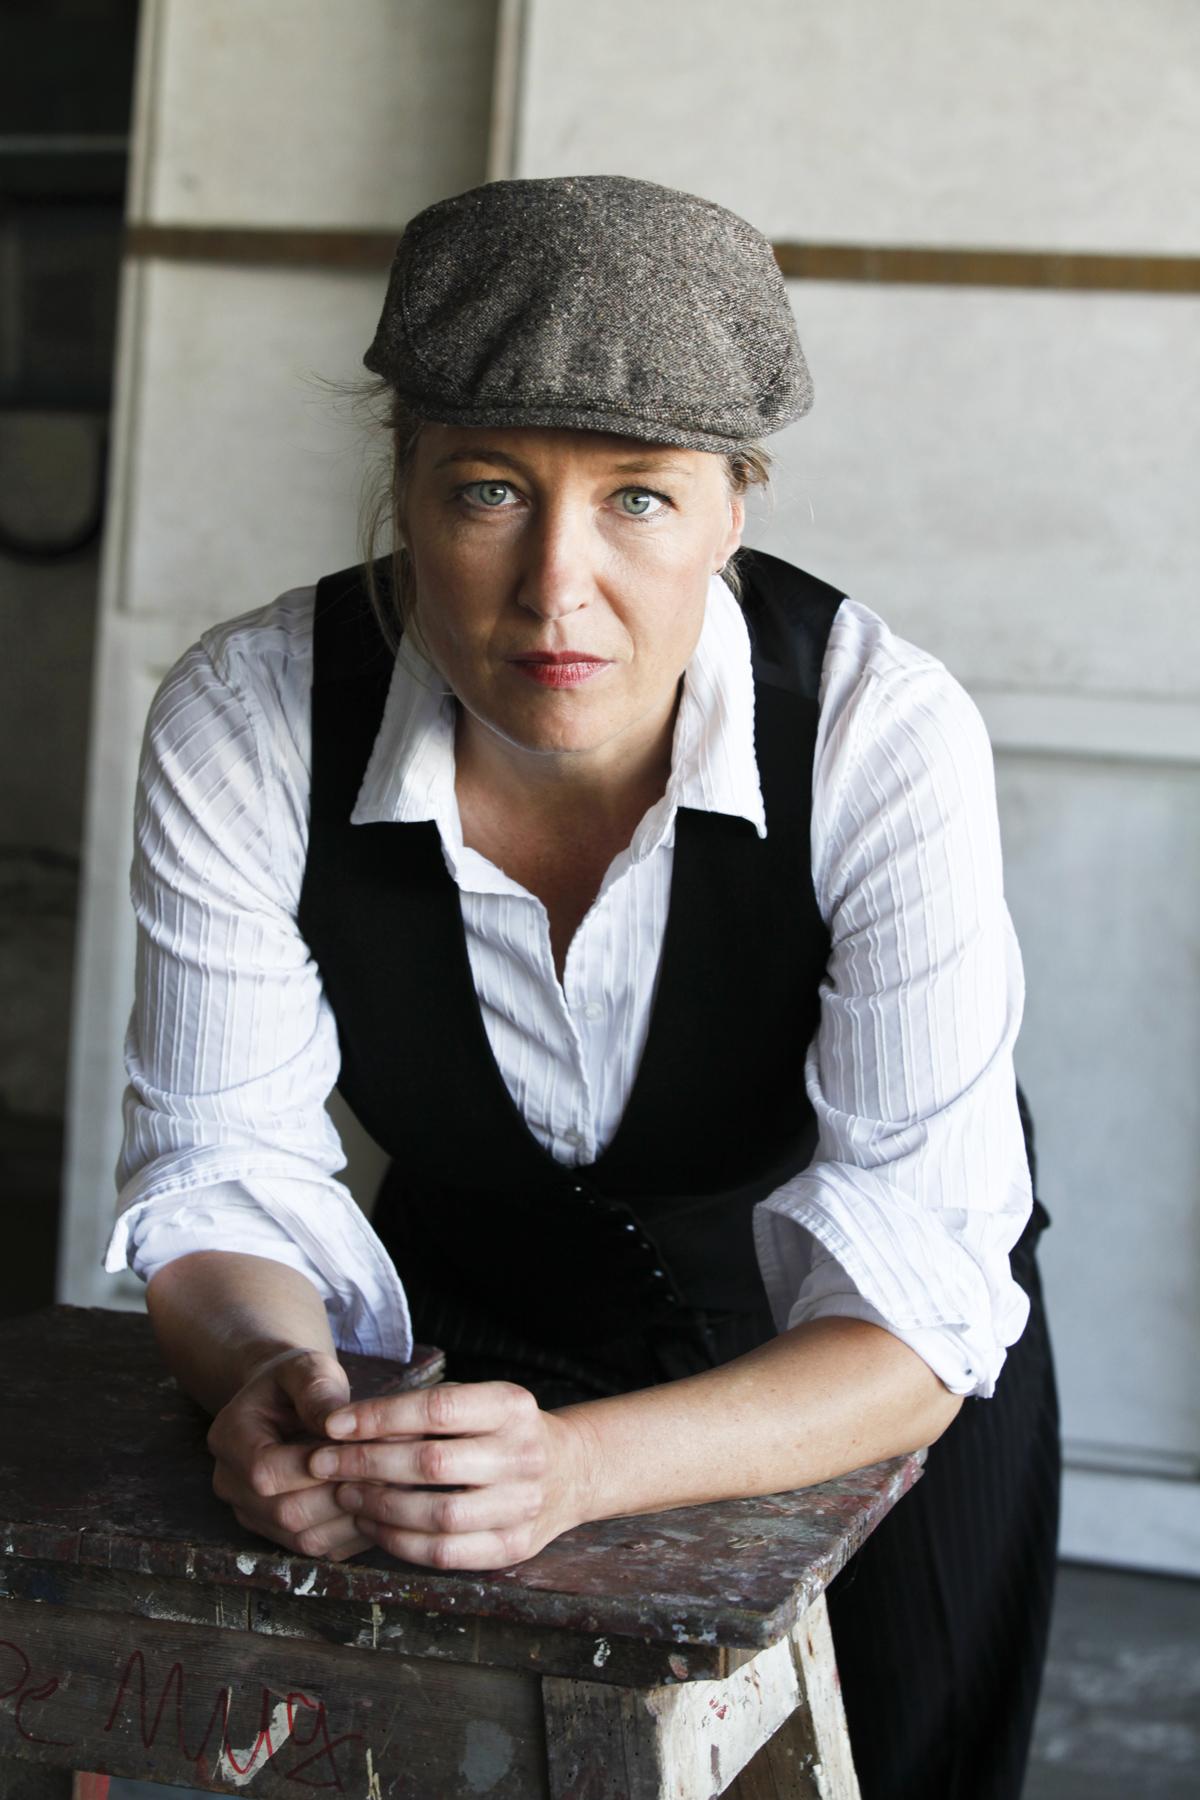 Sonja Hilberger <span>Photo © by Beate Nelken</span>